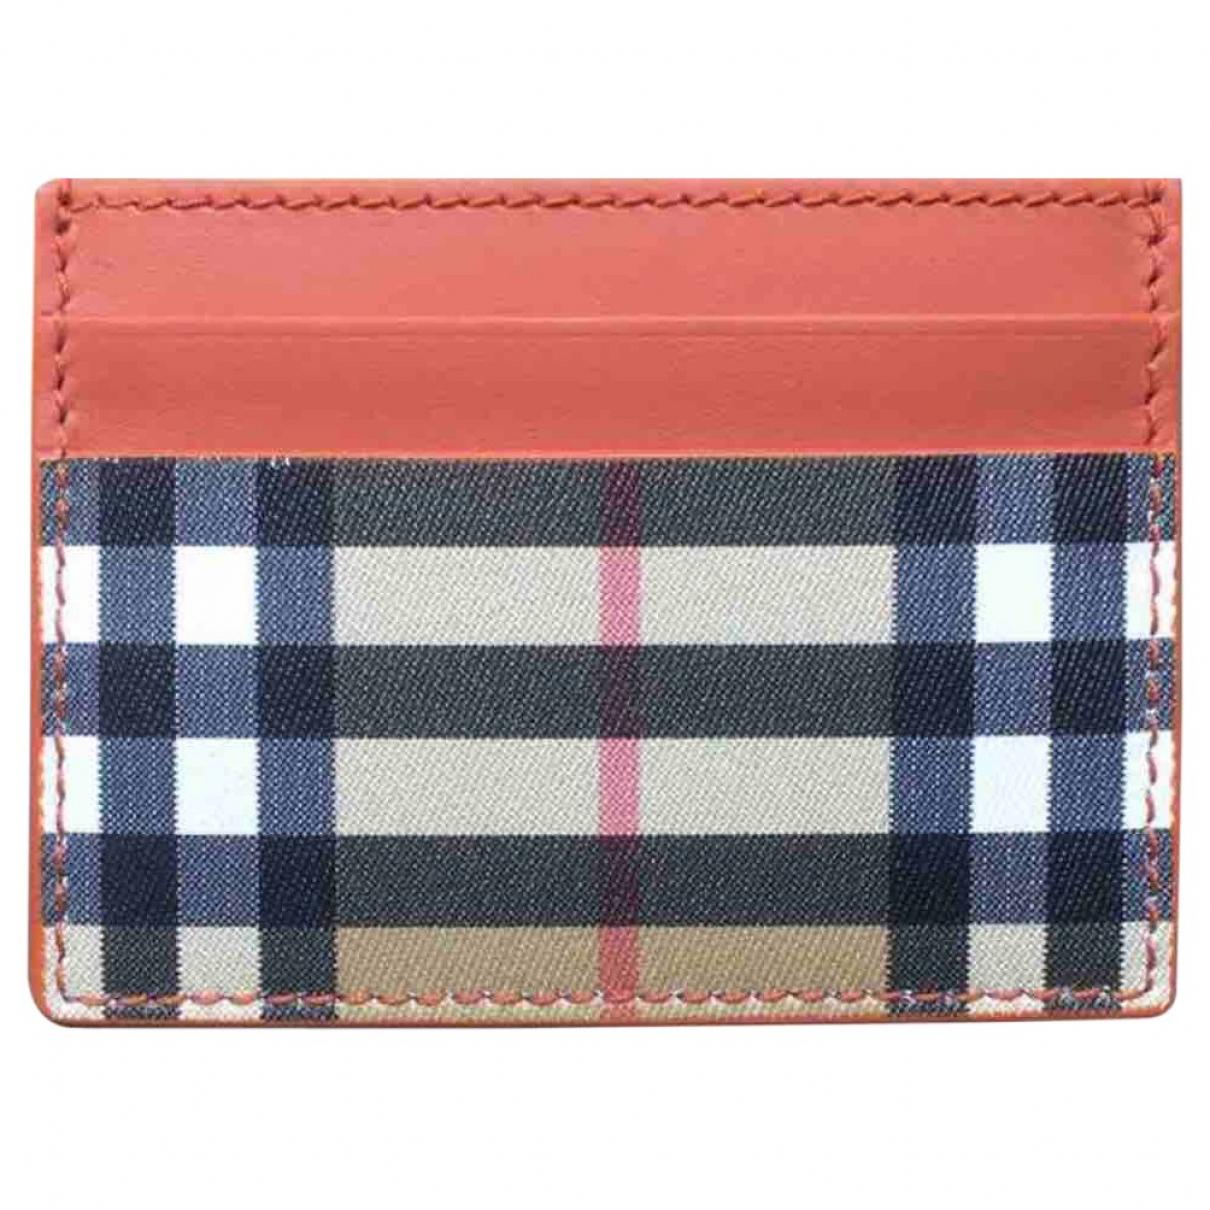 Burberry \N Orange Leather Small bag, wallet & cases for Men \N